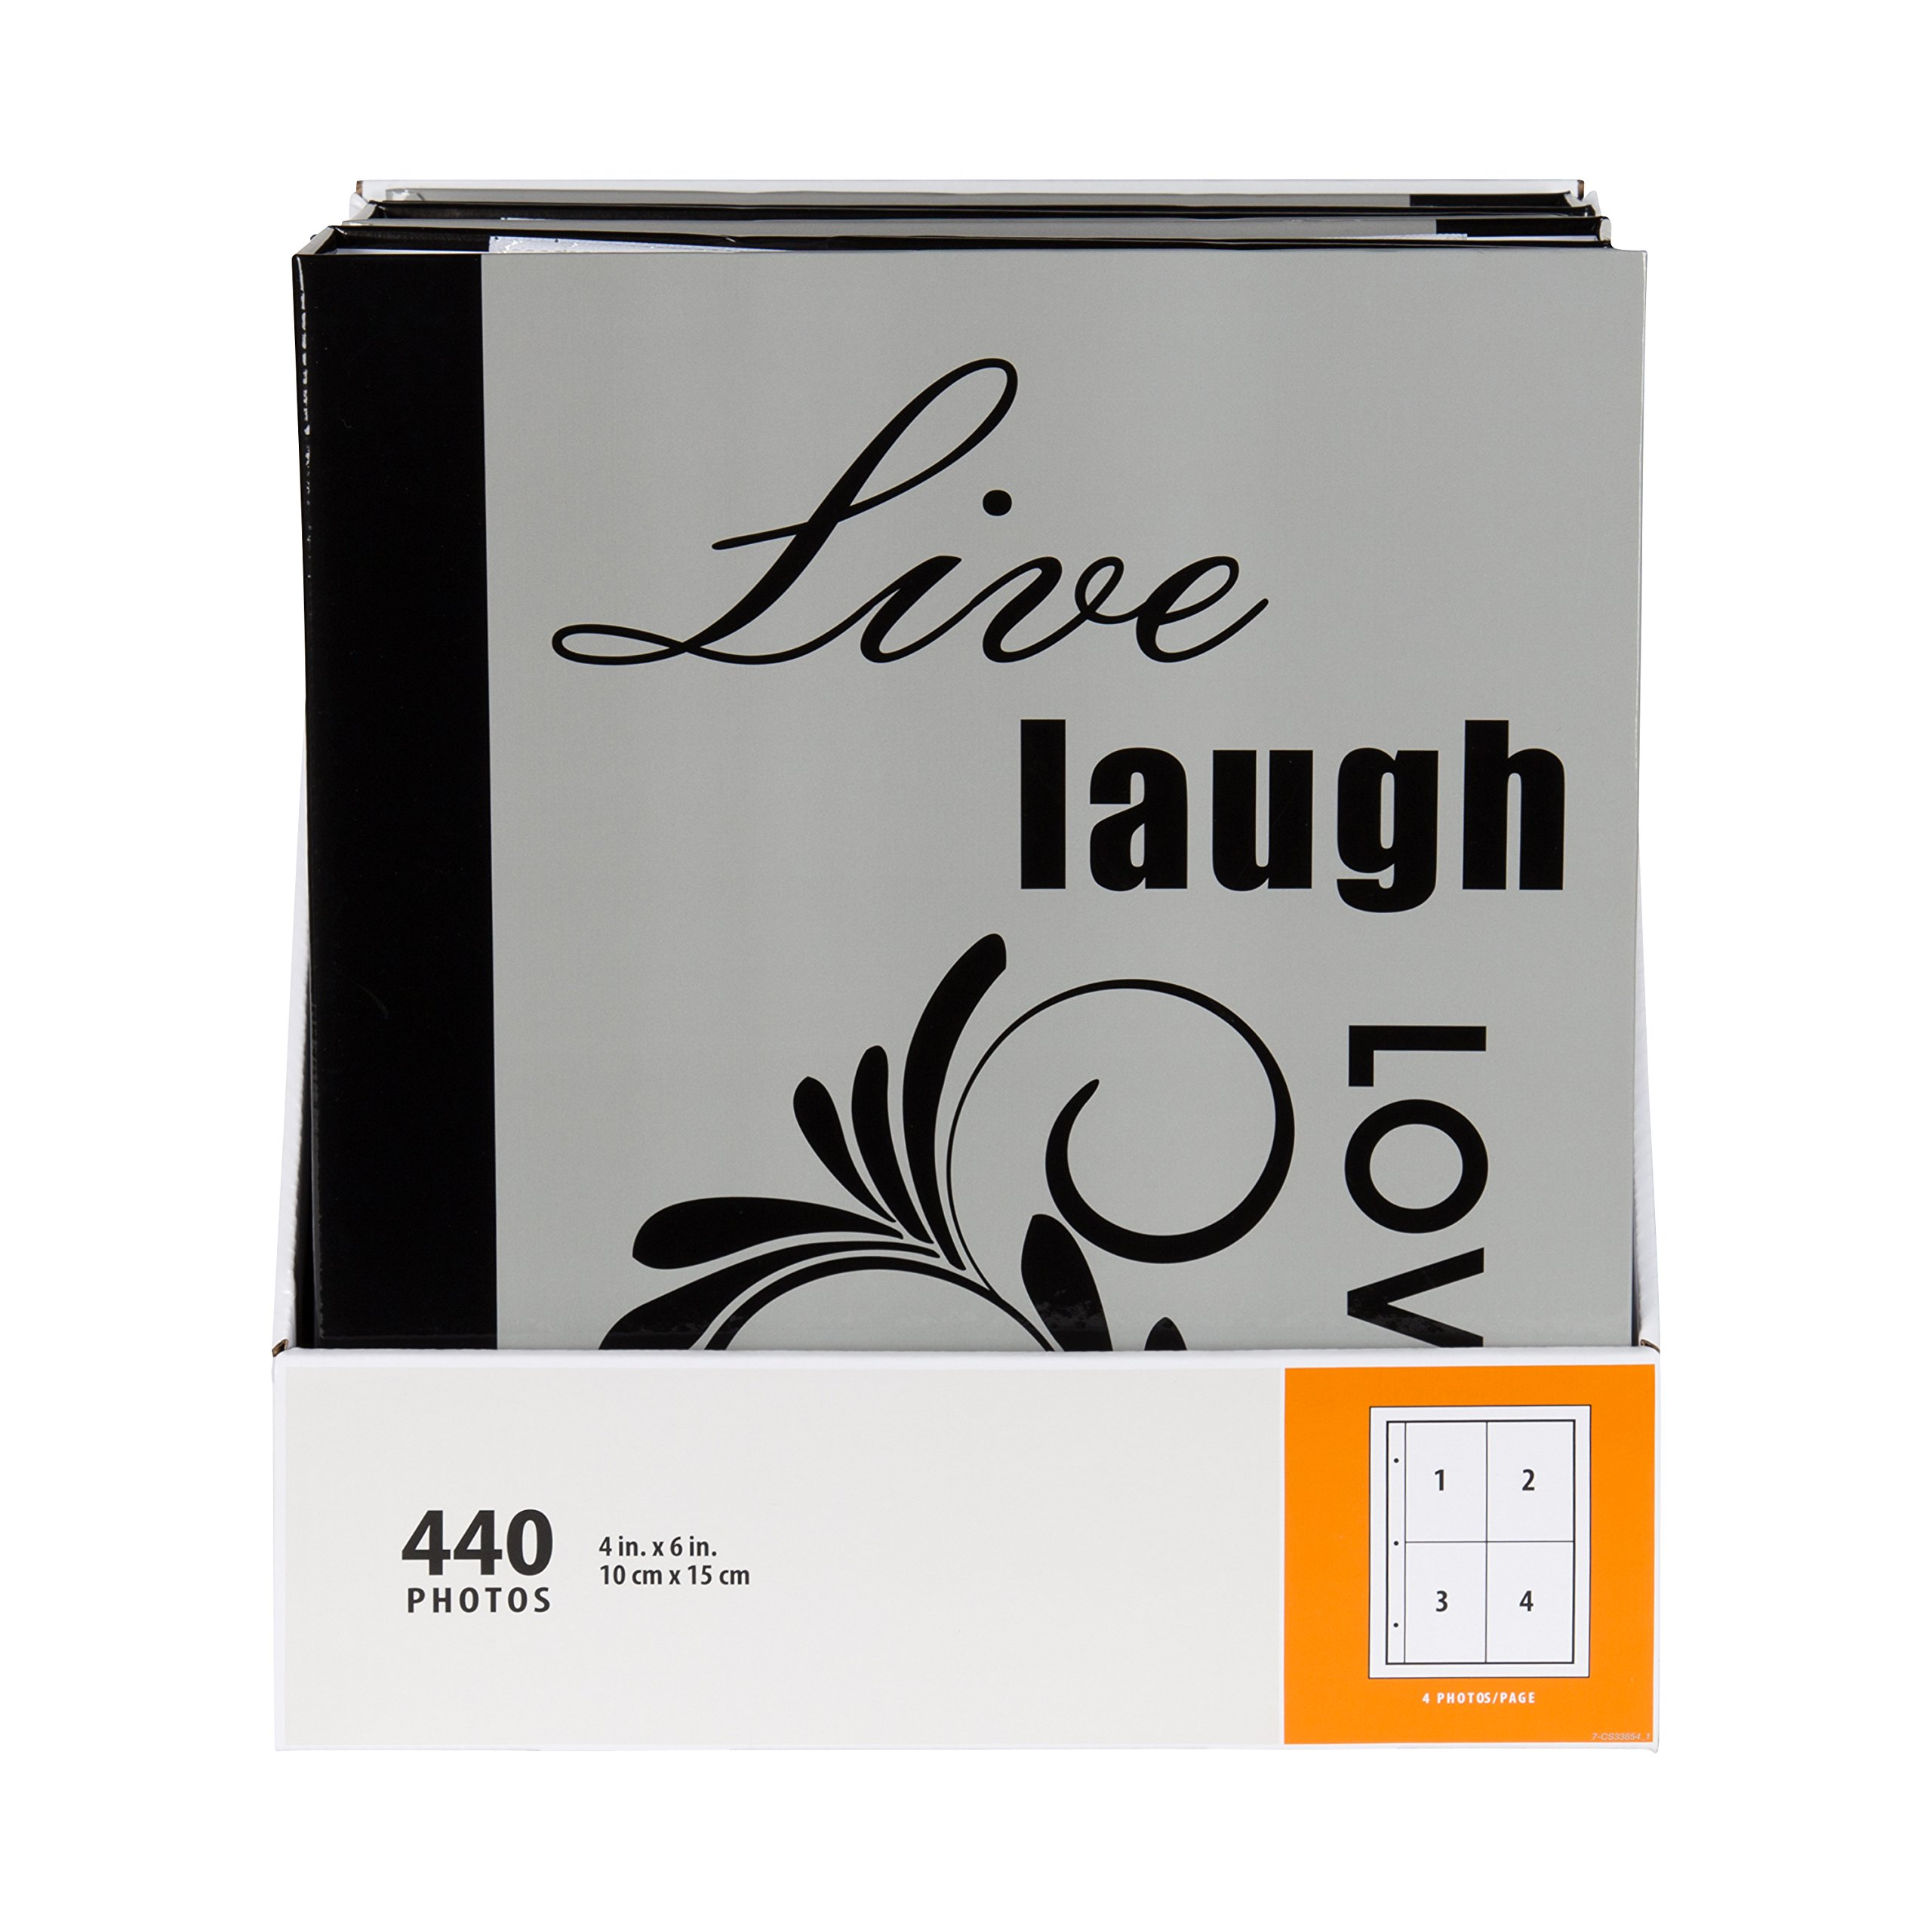 DesignOvation Live Laugh Love Expression Photo Album, Holds 440 4x6 Photos, Set of 4 by DesignOvation (Image #3)